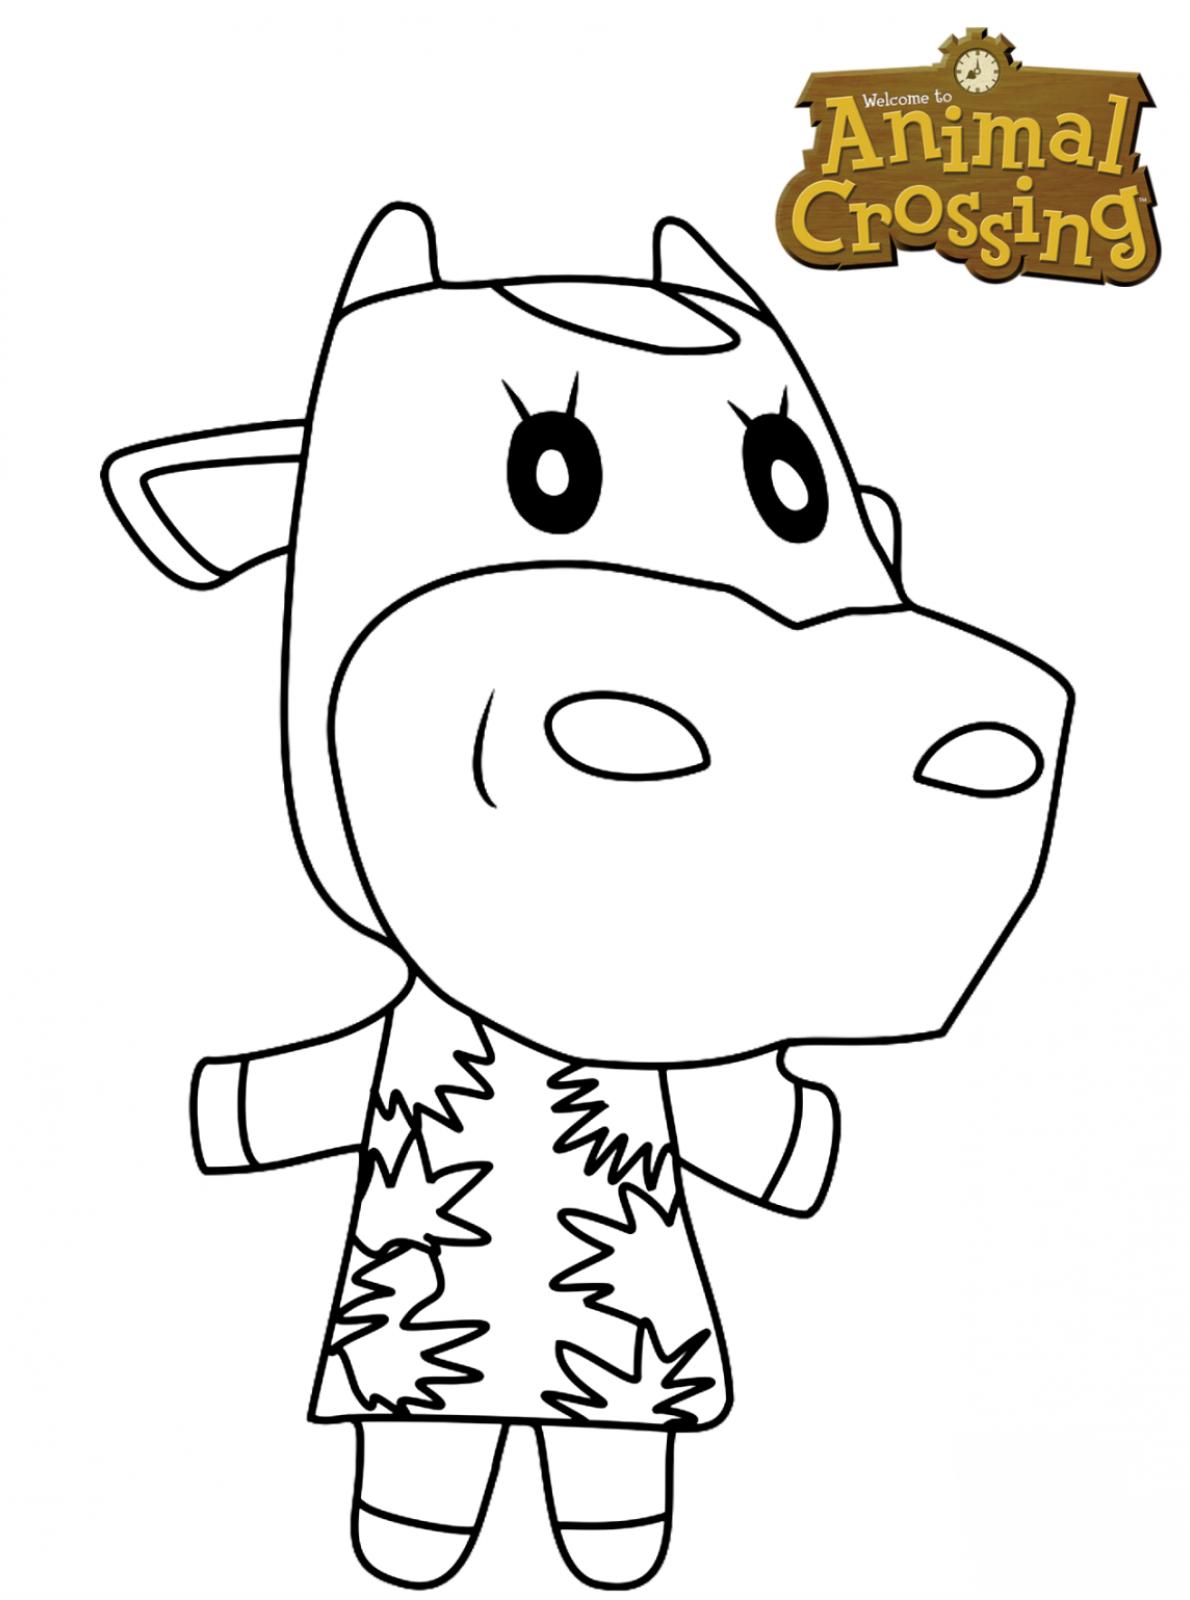 Kids-n-fun.com | Coloring page Animal Crossing Norma